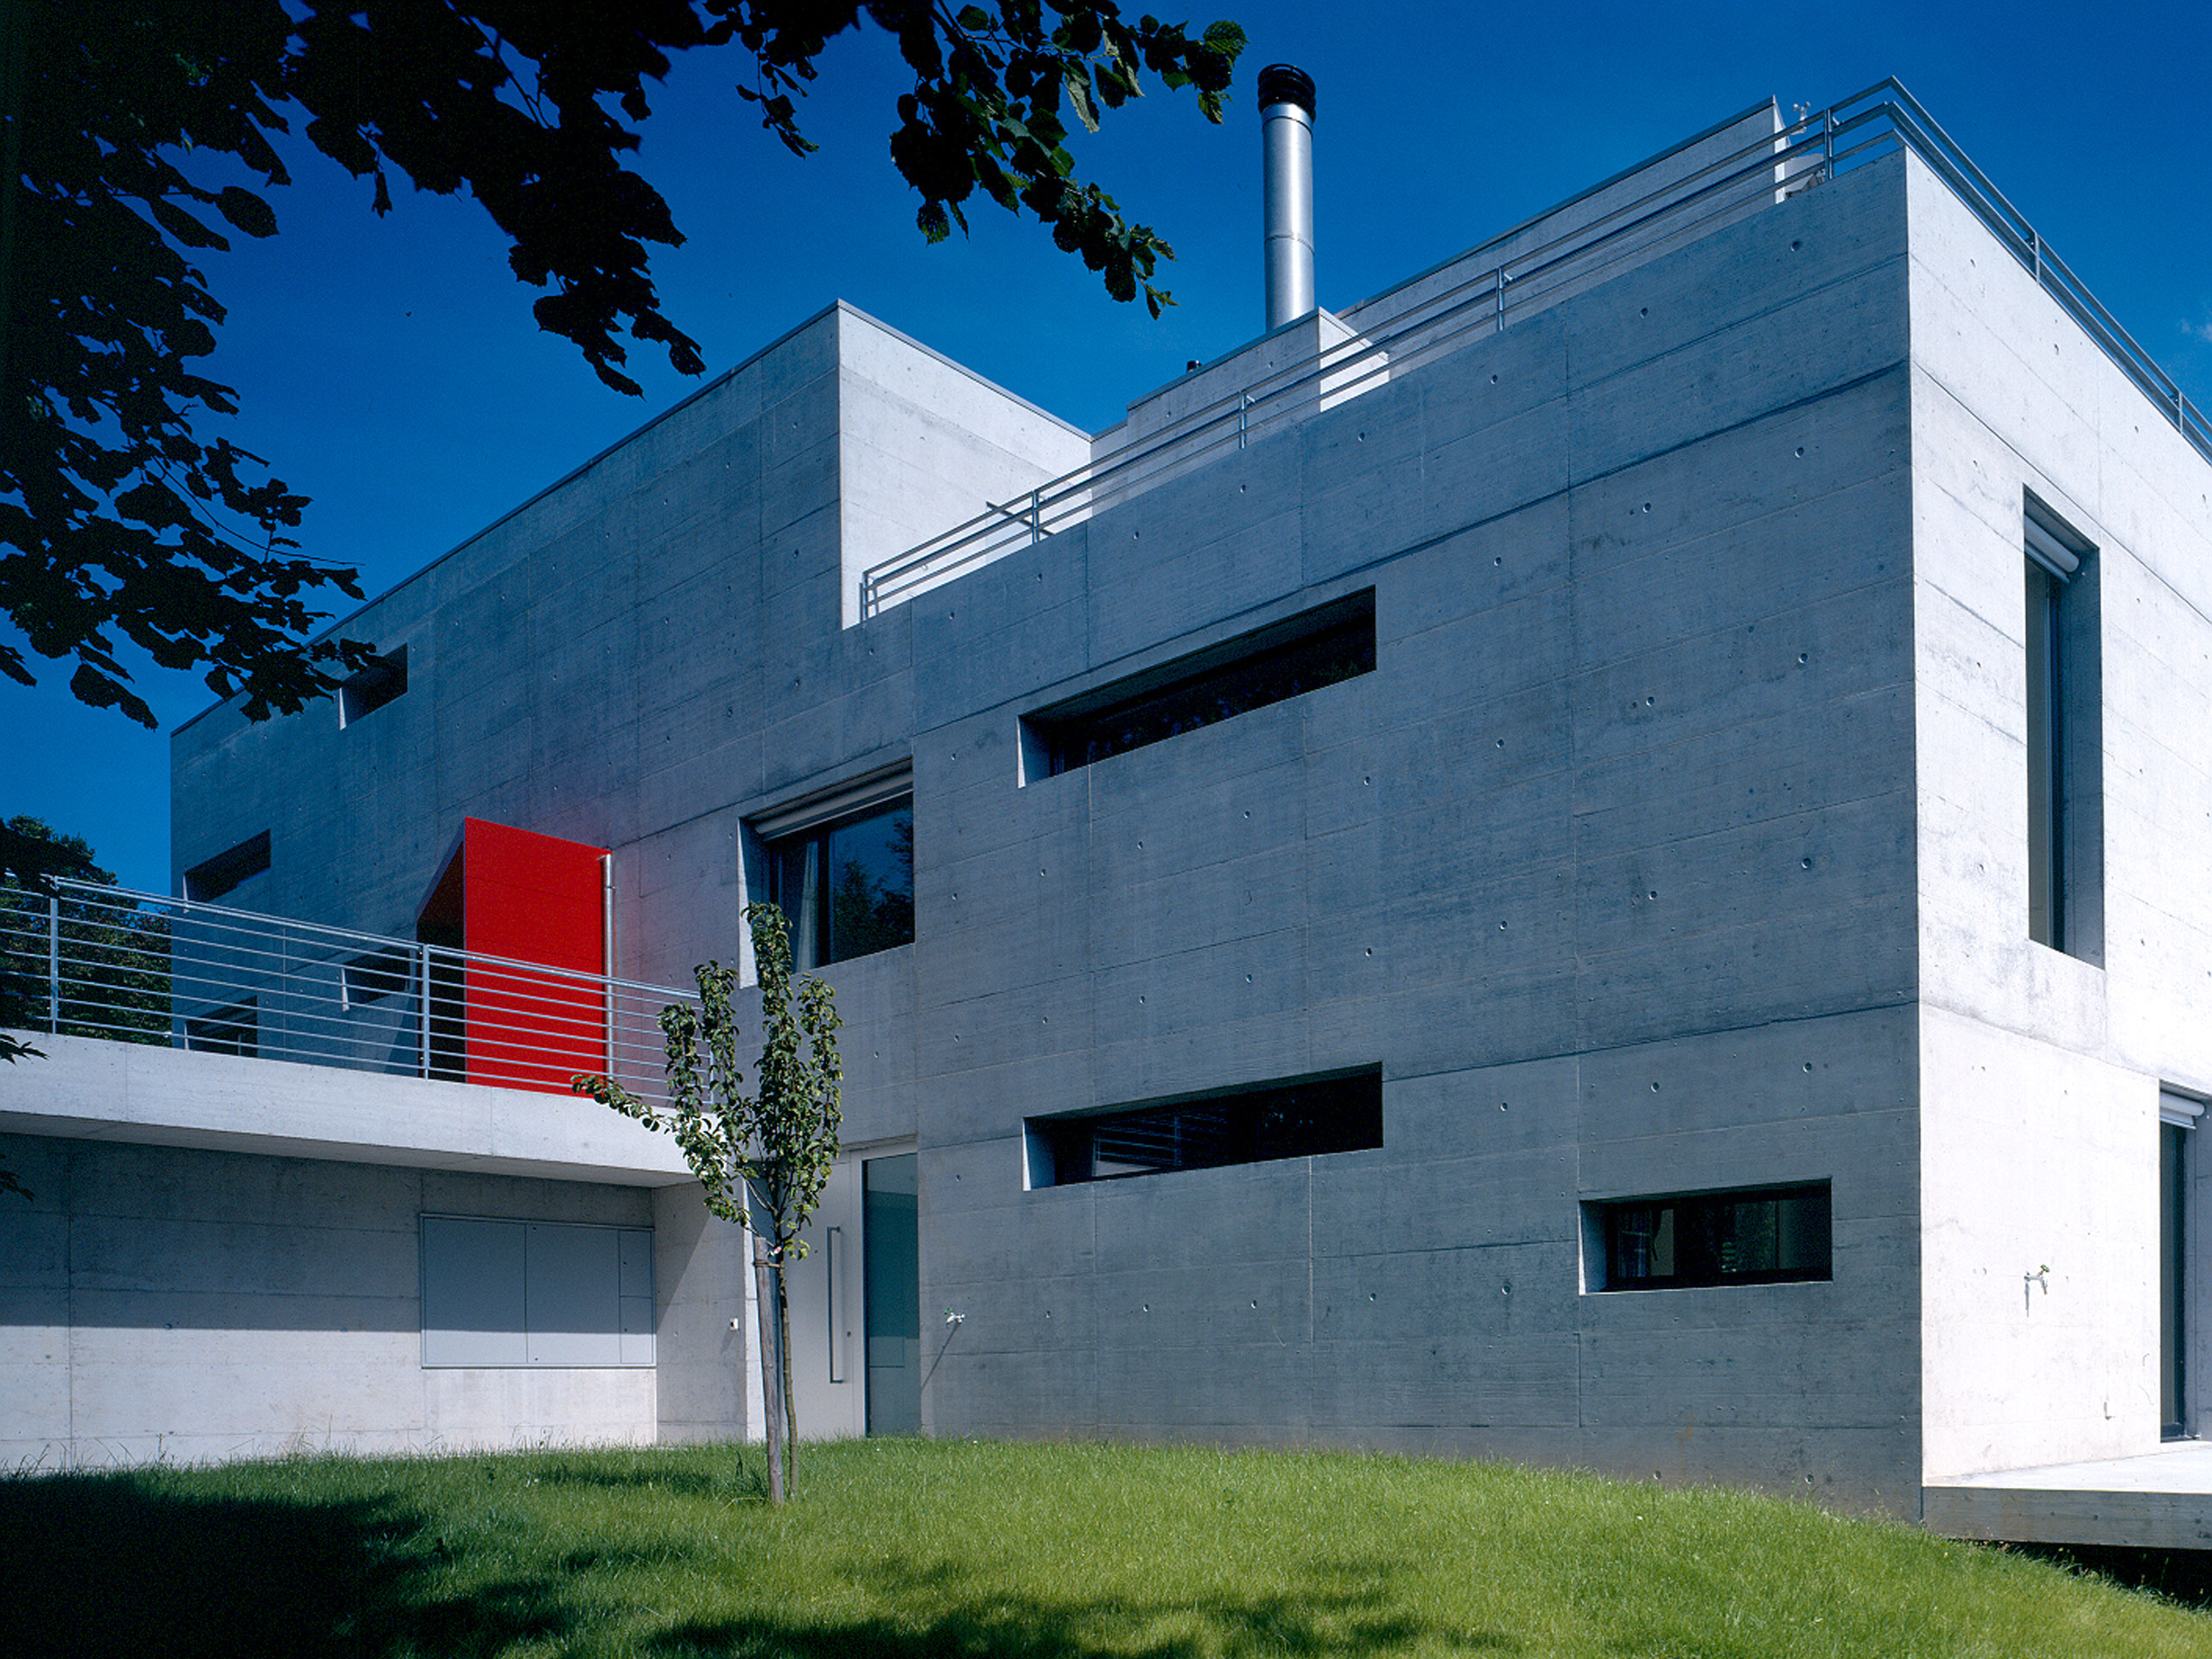 Haus fr hlicher zollikon bob gysin partner bgp - Bob gysin partner bgp architekten ...